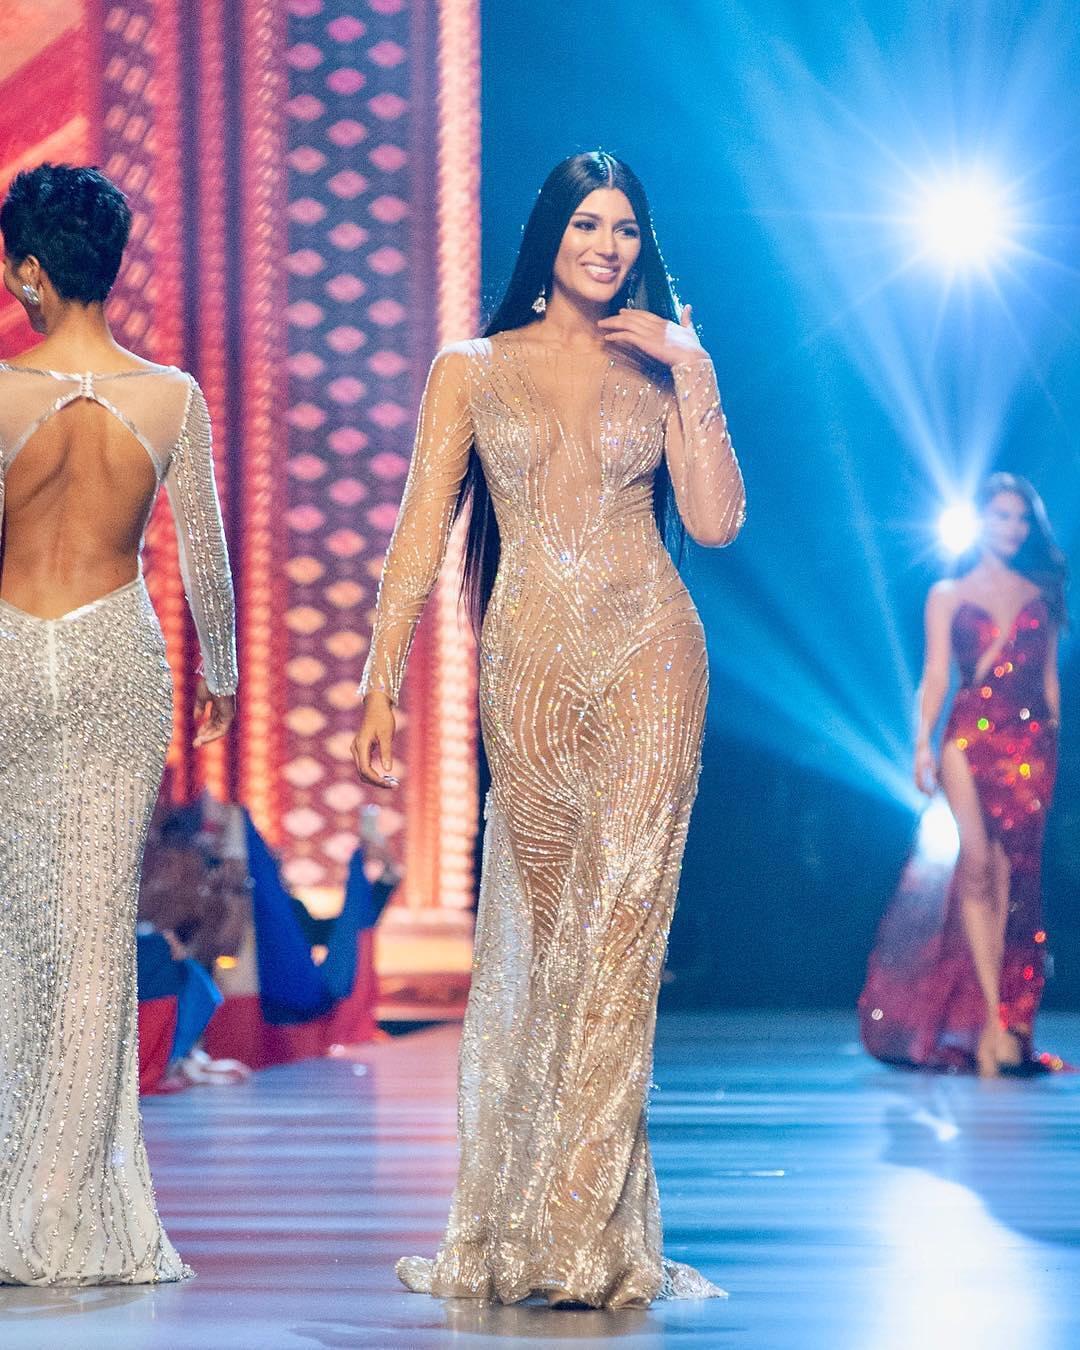 sthefany gutierrez, top 3 de miss universe 2018. - Página 23 Tgnsrj10